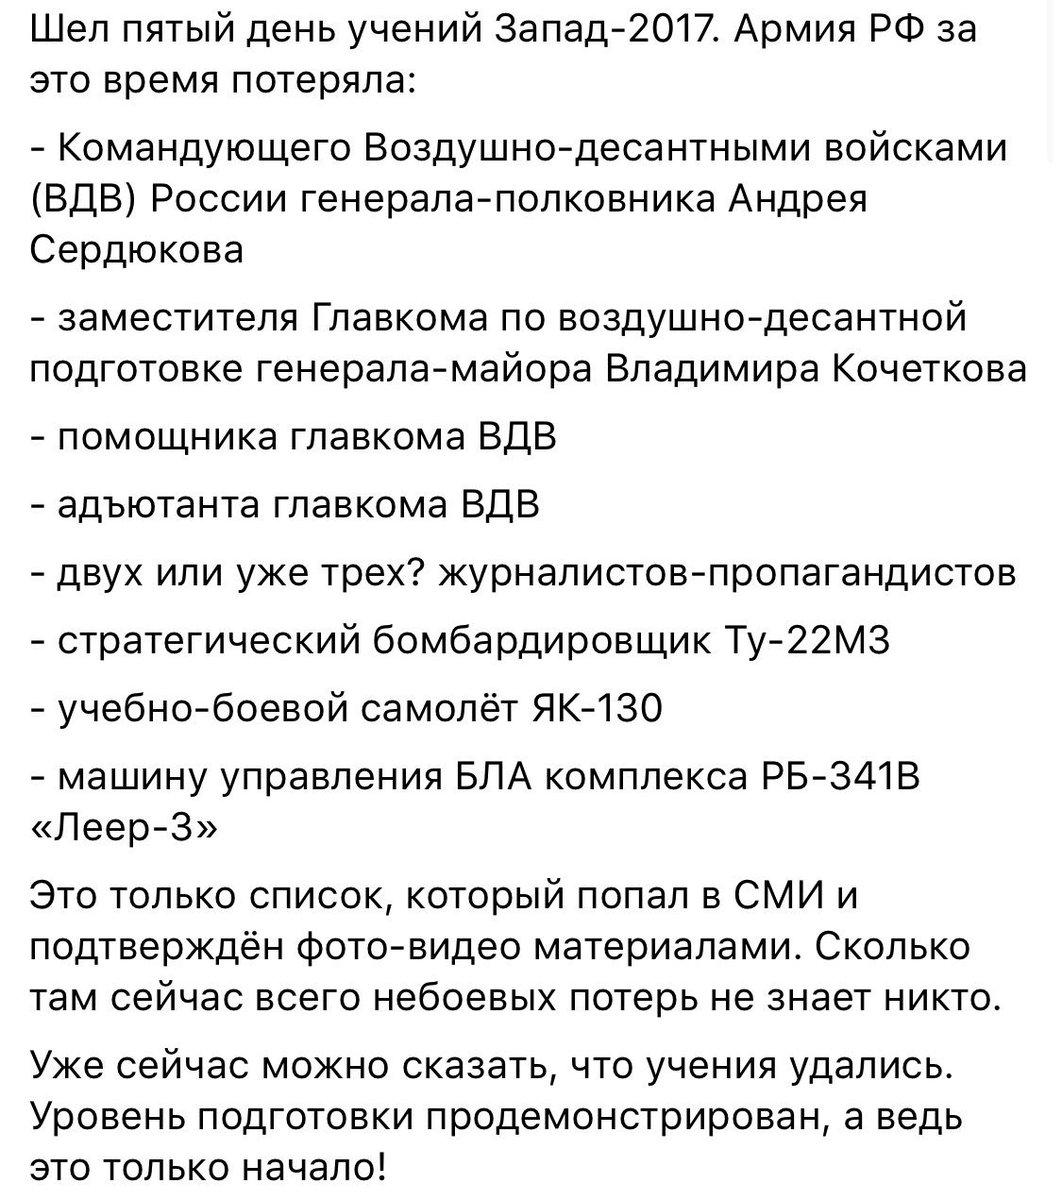 На Майдане развернули 15-метровый исторический флаг Беларуси - Цензор.НЕТ 4310